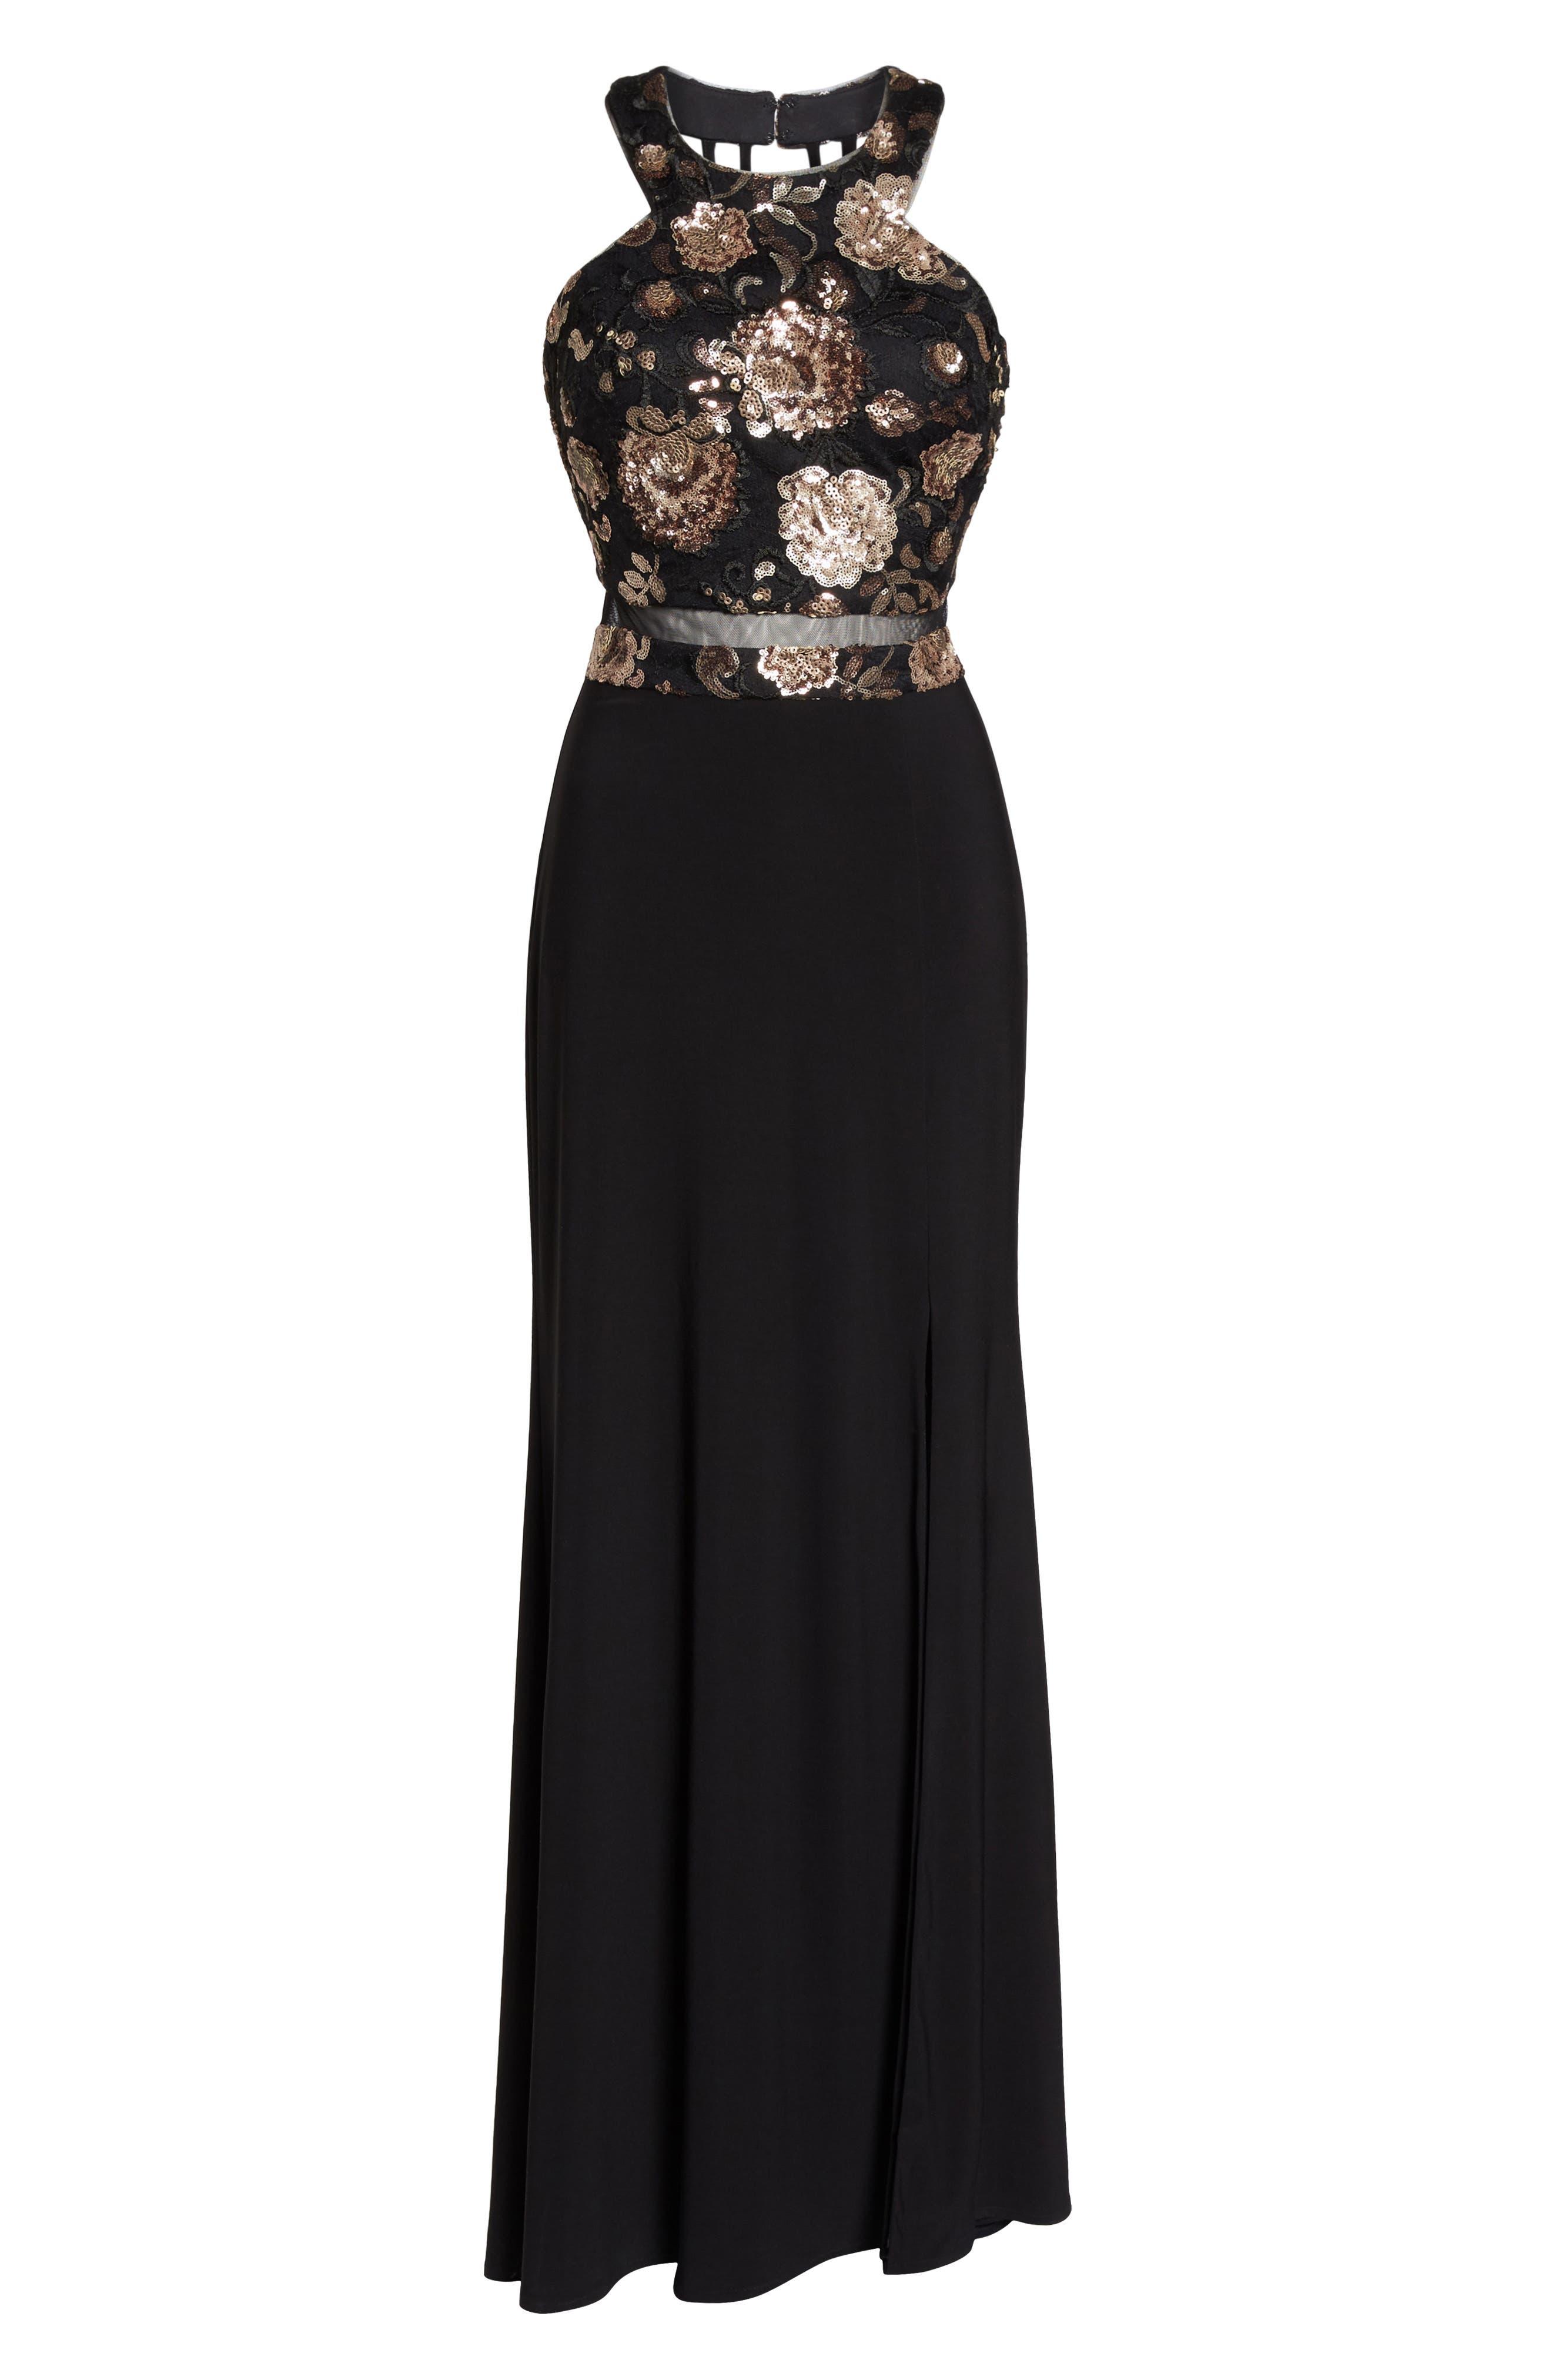 MORGAN & CO.,                             Sequin Mesh Panel Gown,                             Alternate thumbnail 6, color,                             BLACK / ROSE GOLD